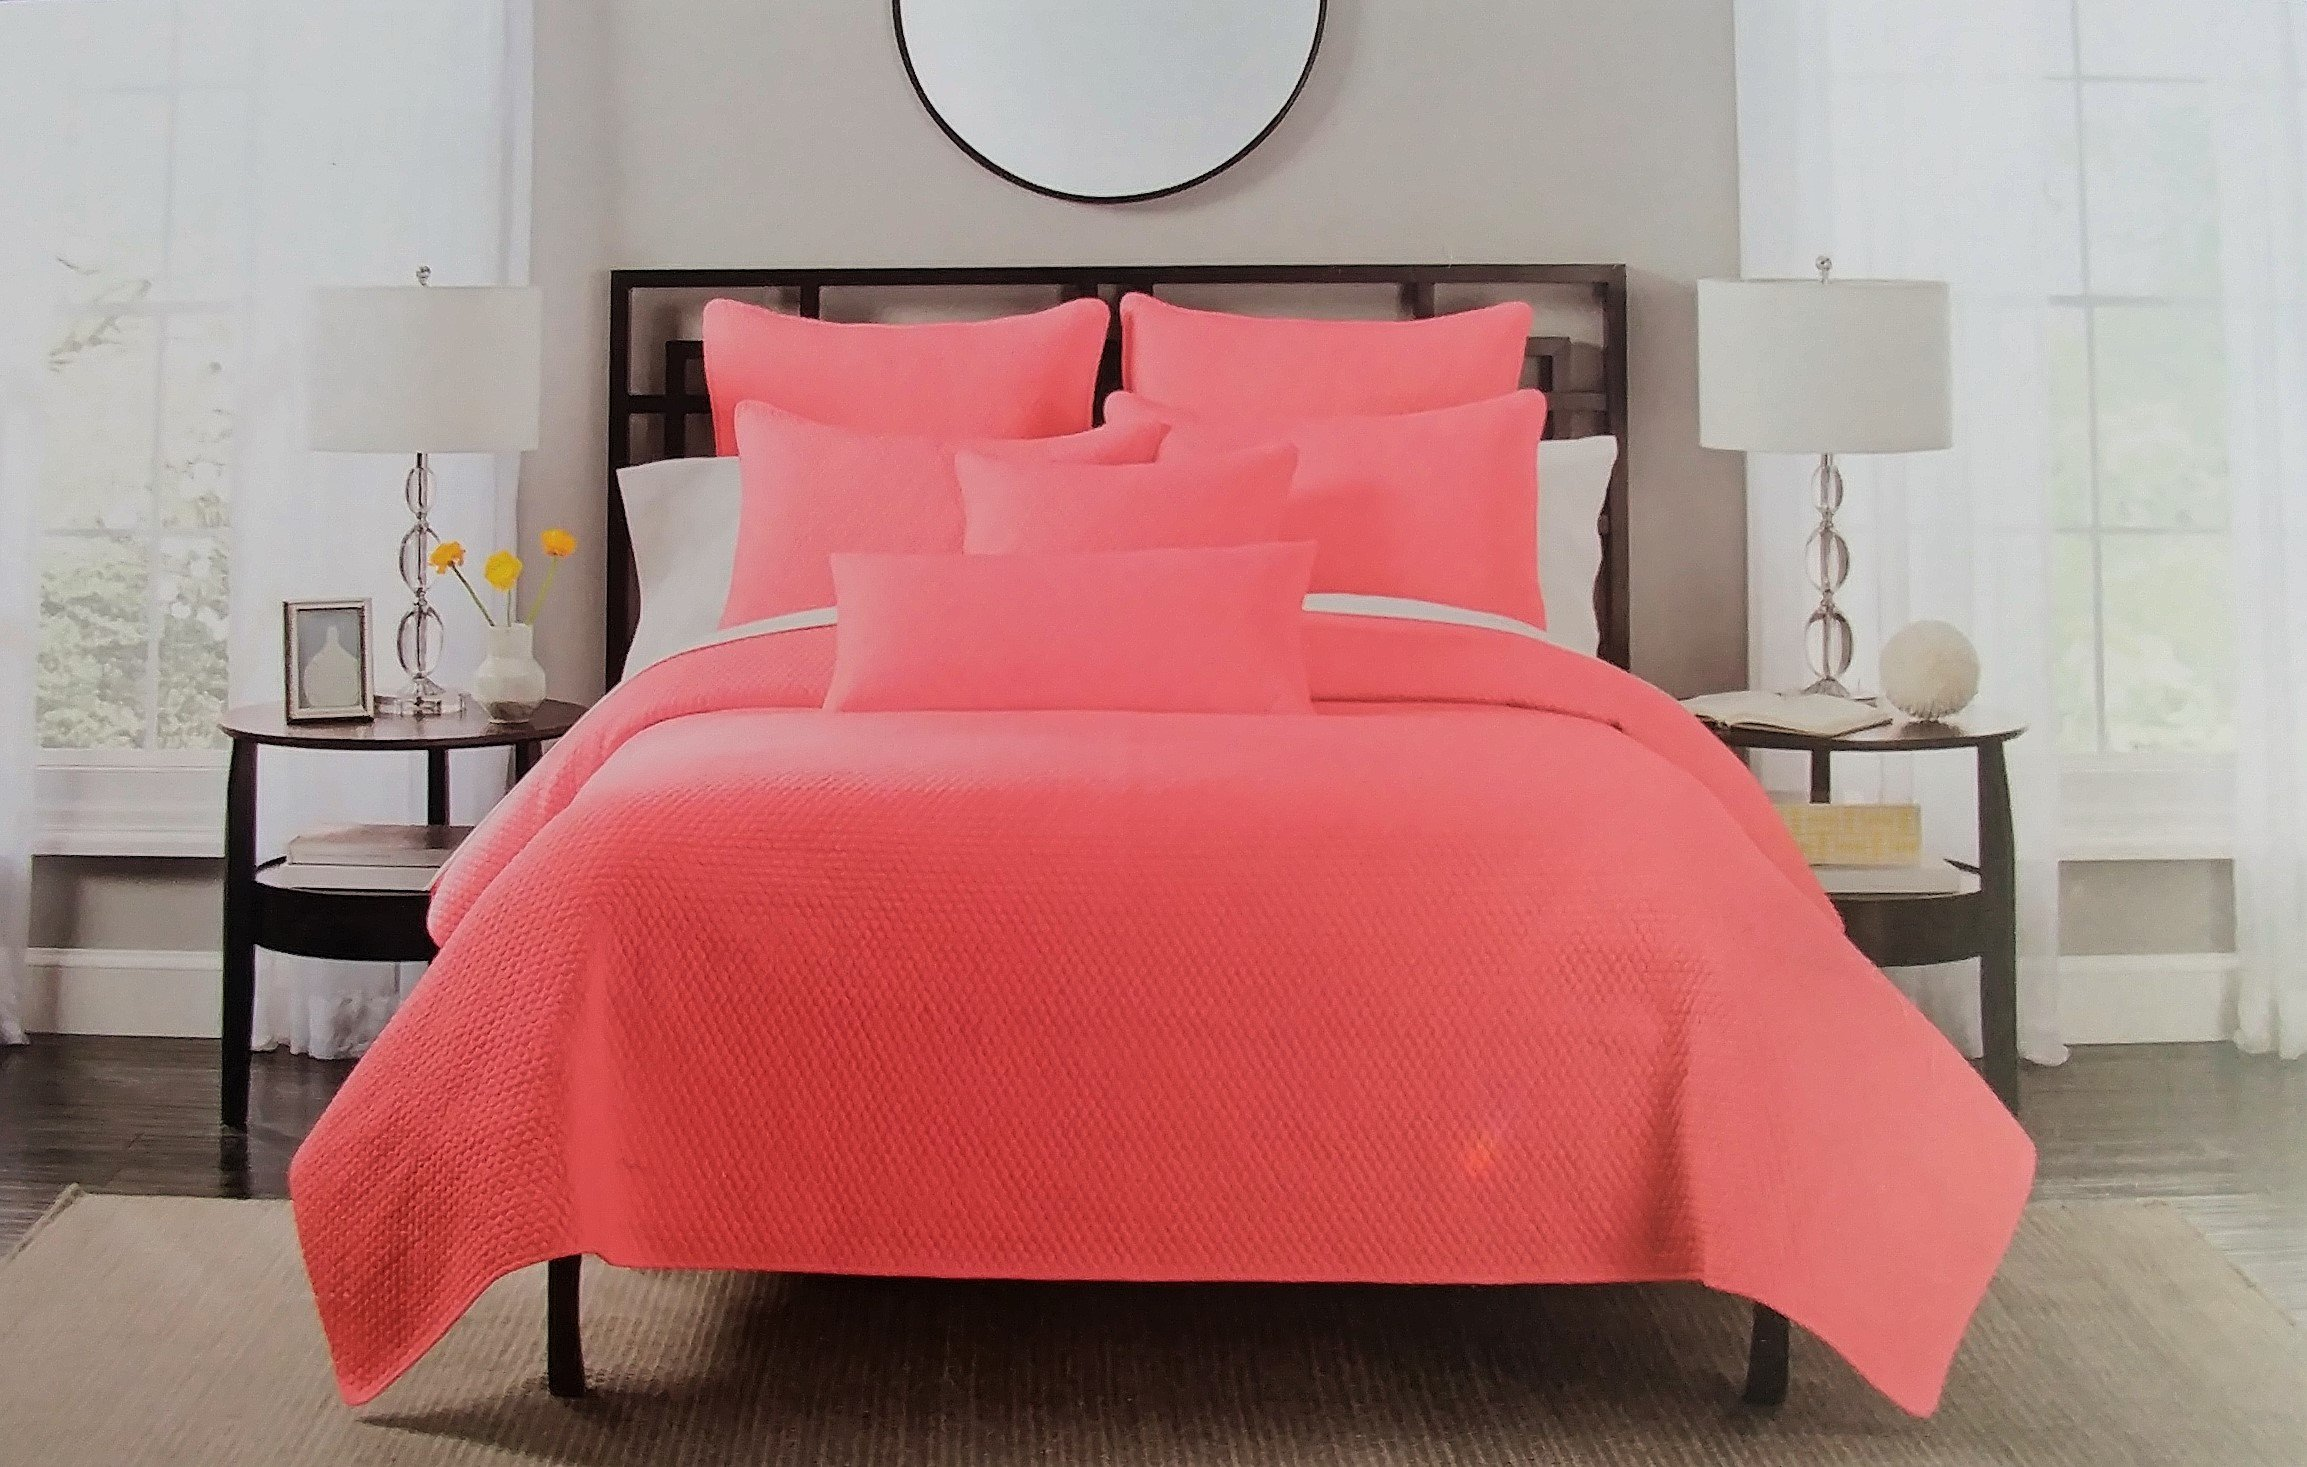 Hotel Balfour 2 Piece Coral Quilt Set TWIN